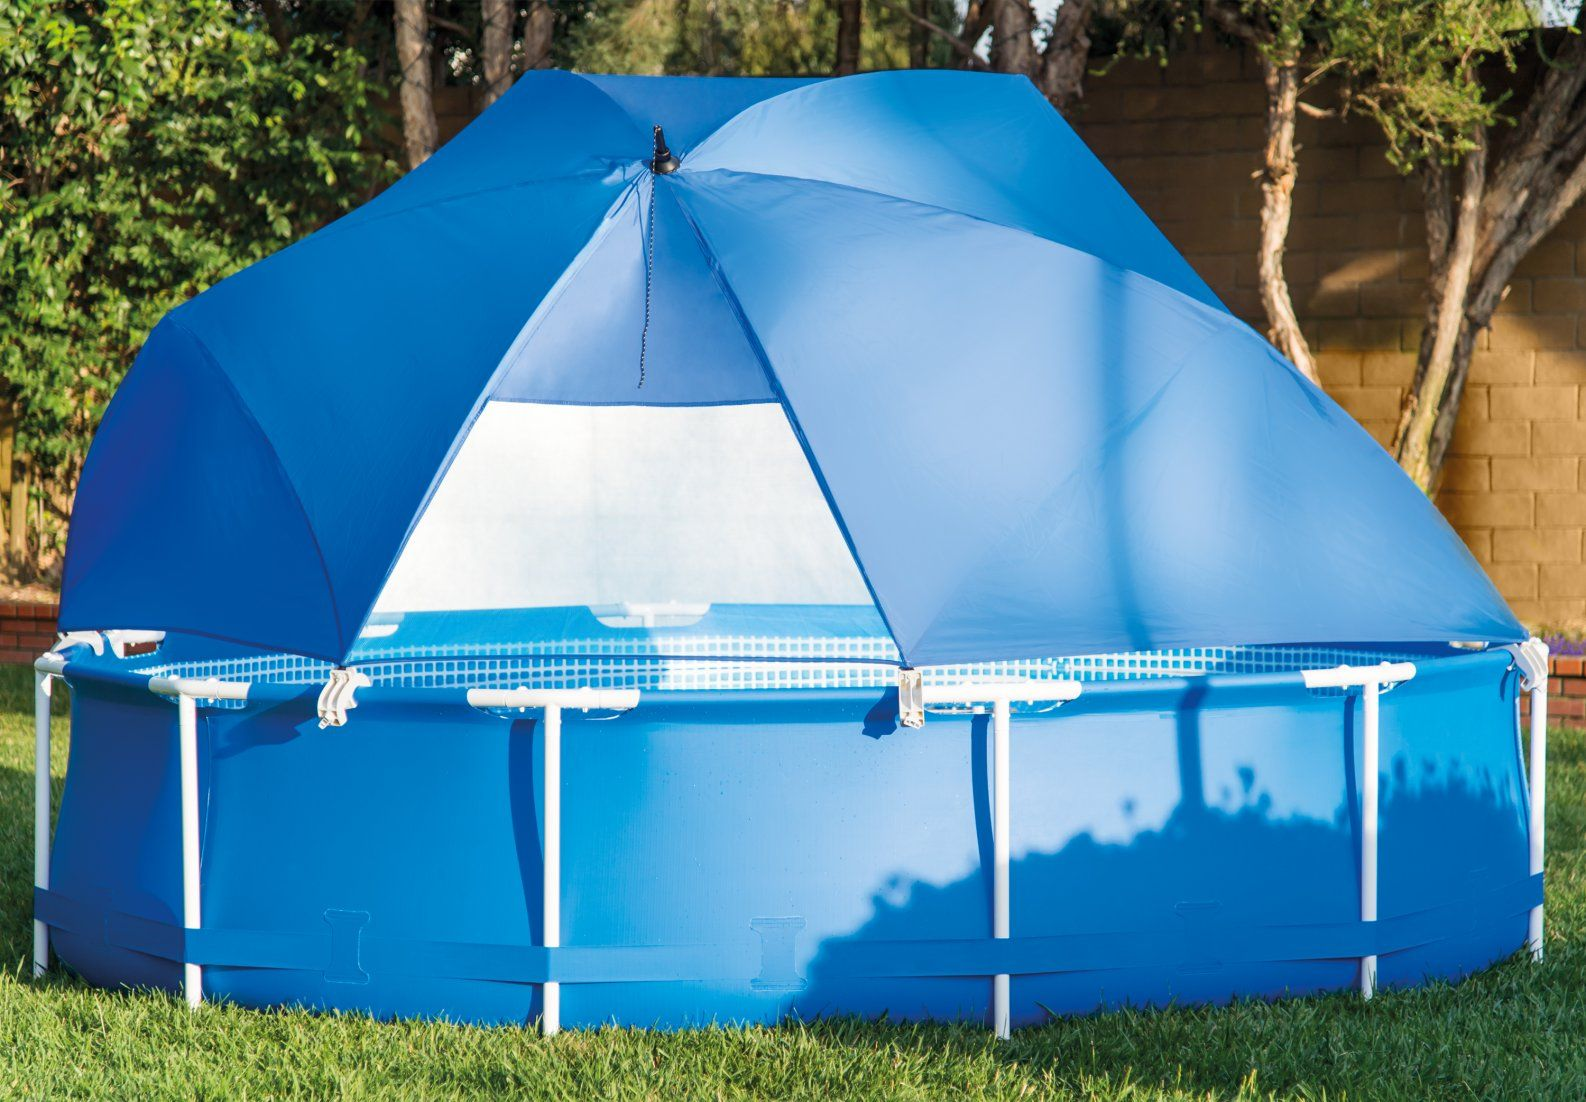 Pool Canopy Pool canopy, Swimming pool equipment, Pool